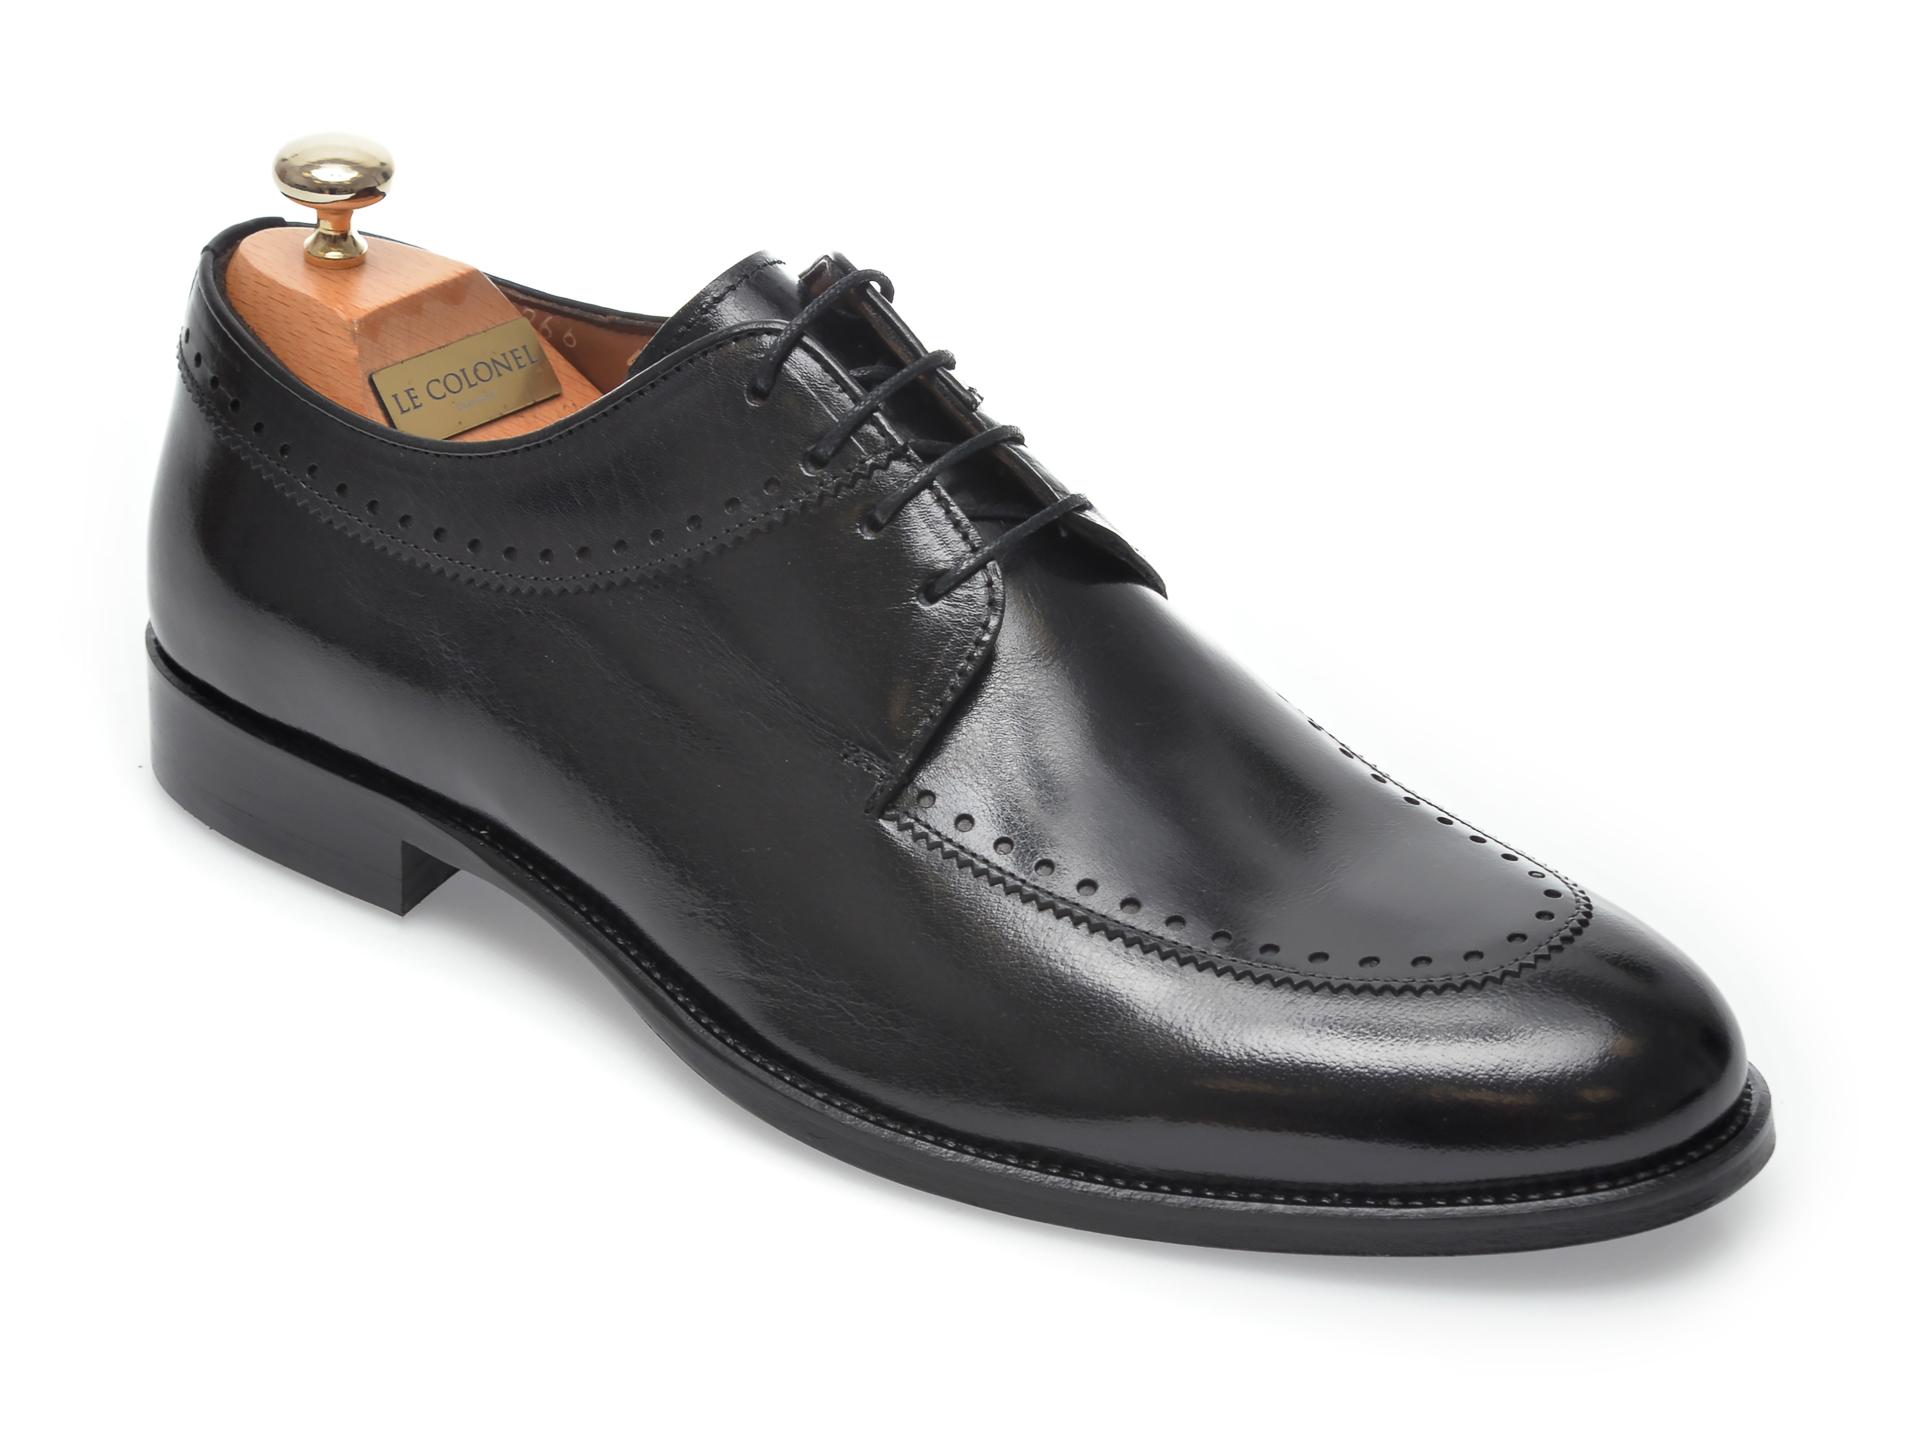 Pantofi LE COLONEL negri, 45266, din piele naturala imagine